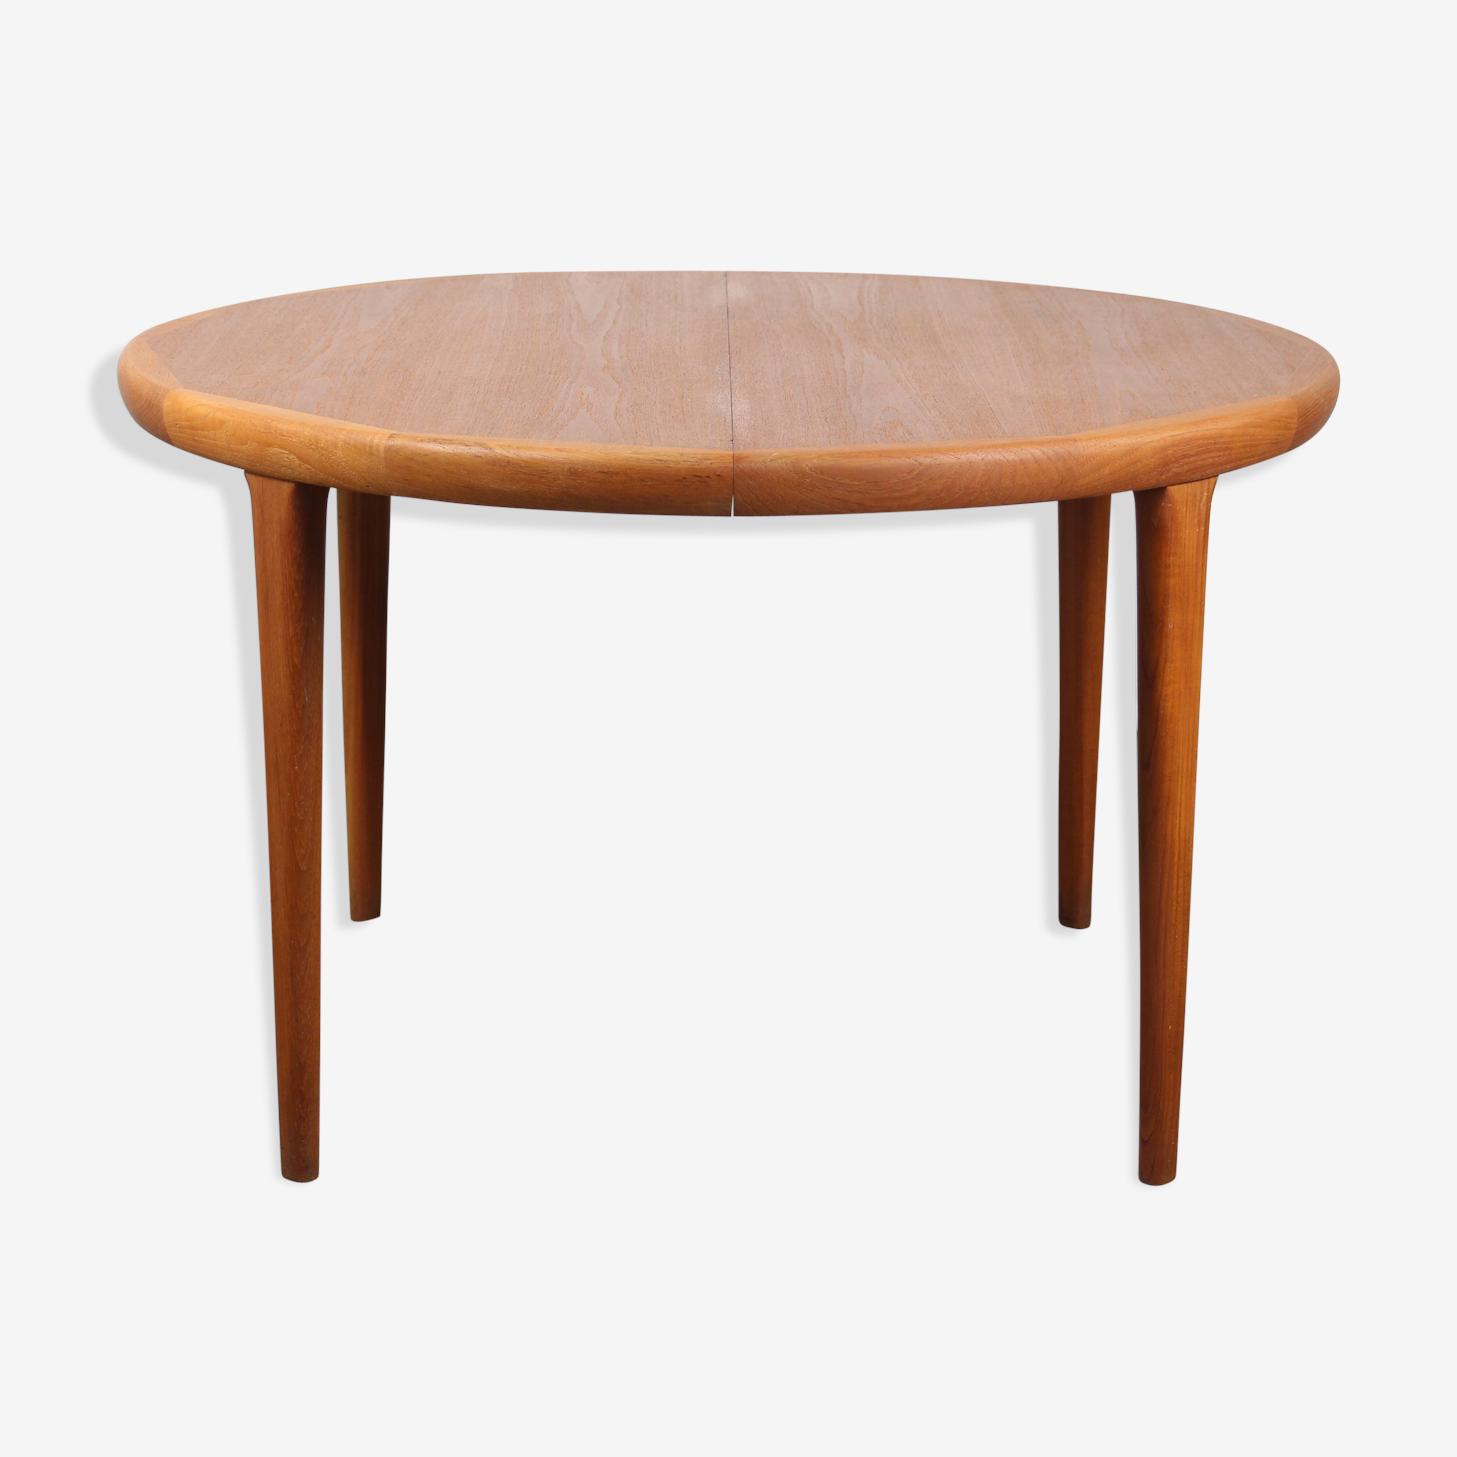 Table round Scandinavian teak